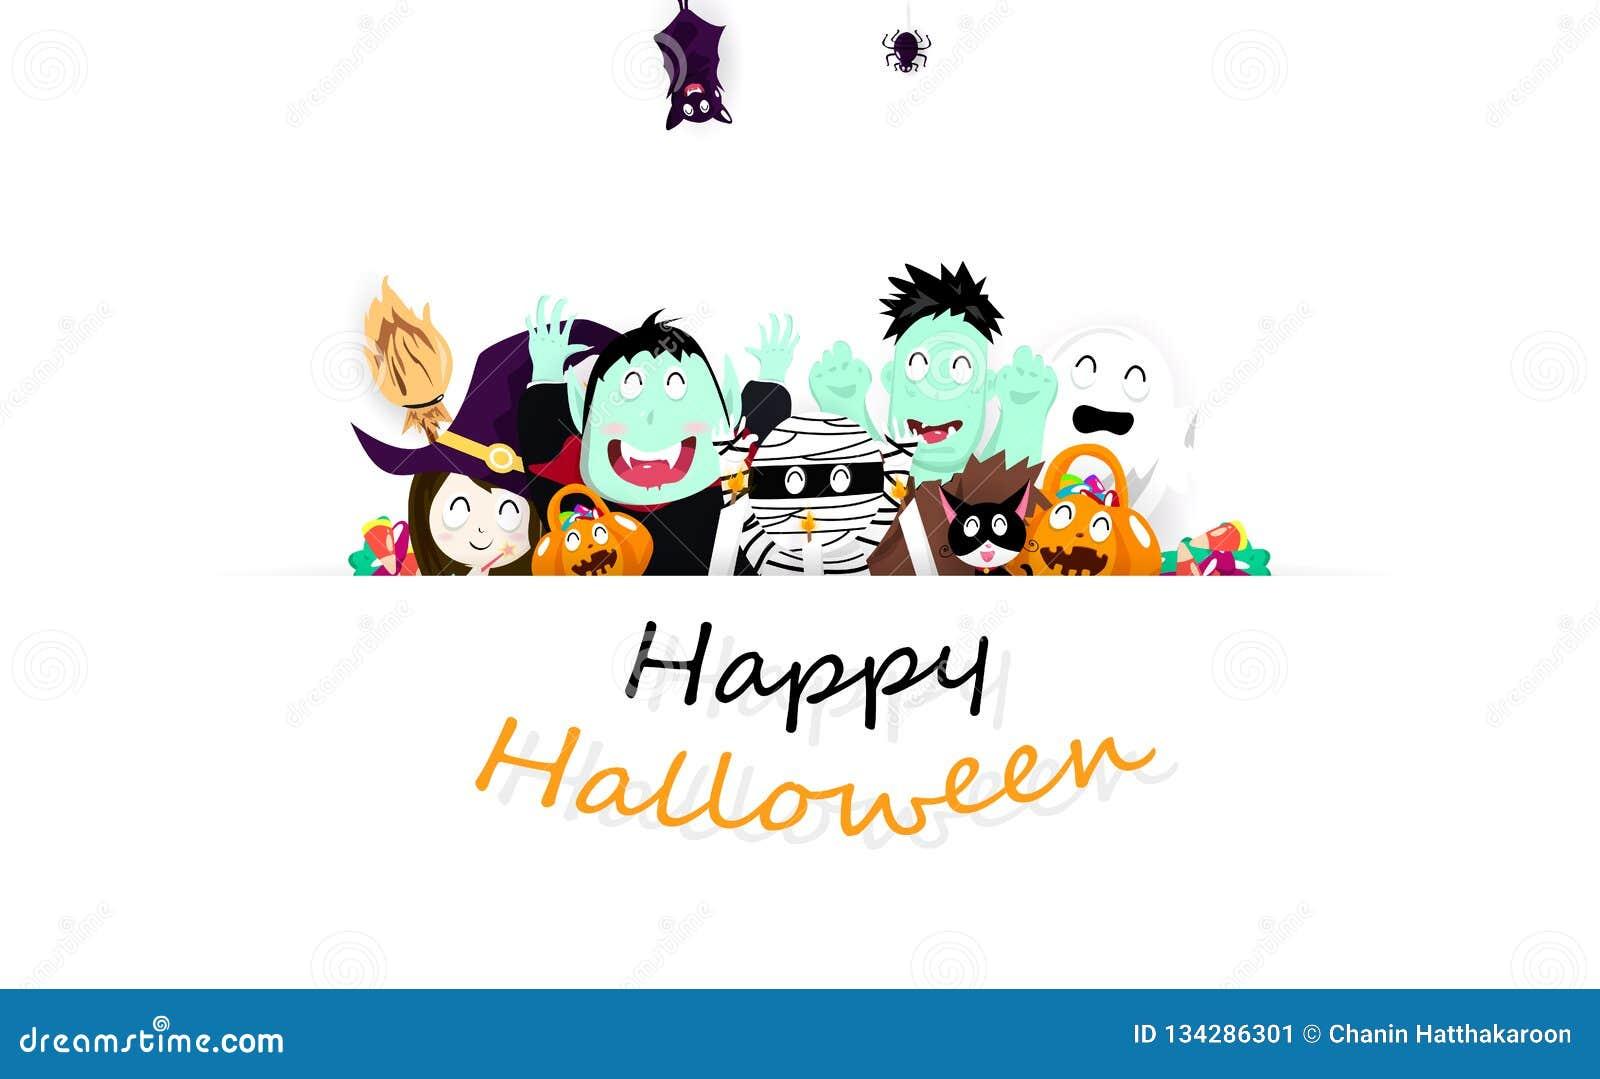 Descargar Epub Happy Halloween, Surprise Party Paper Art